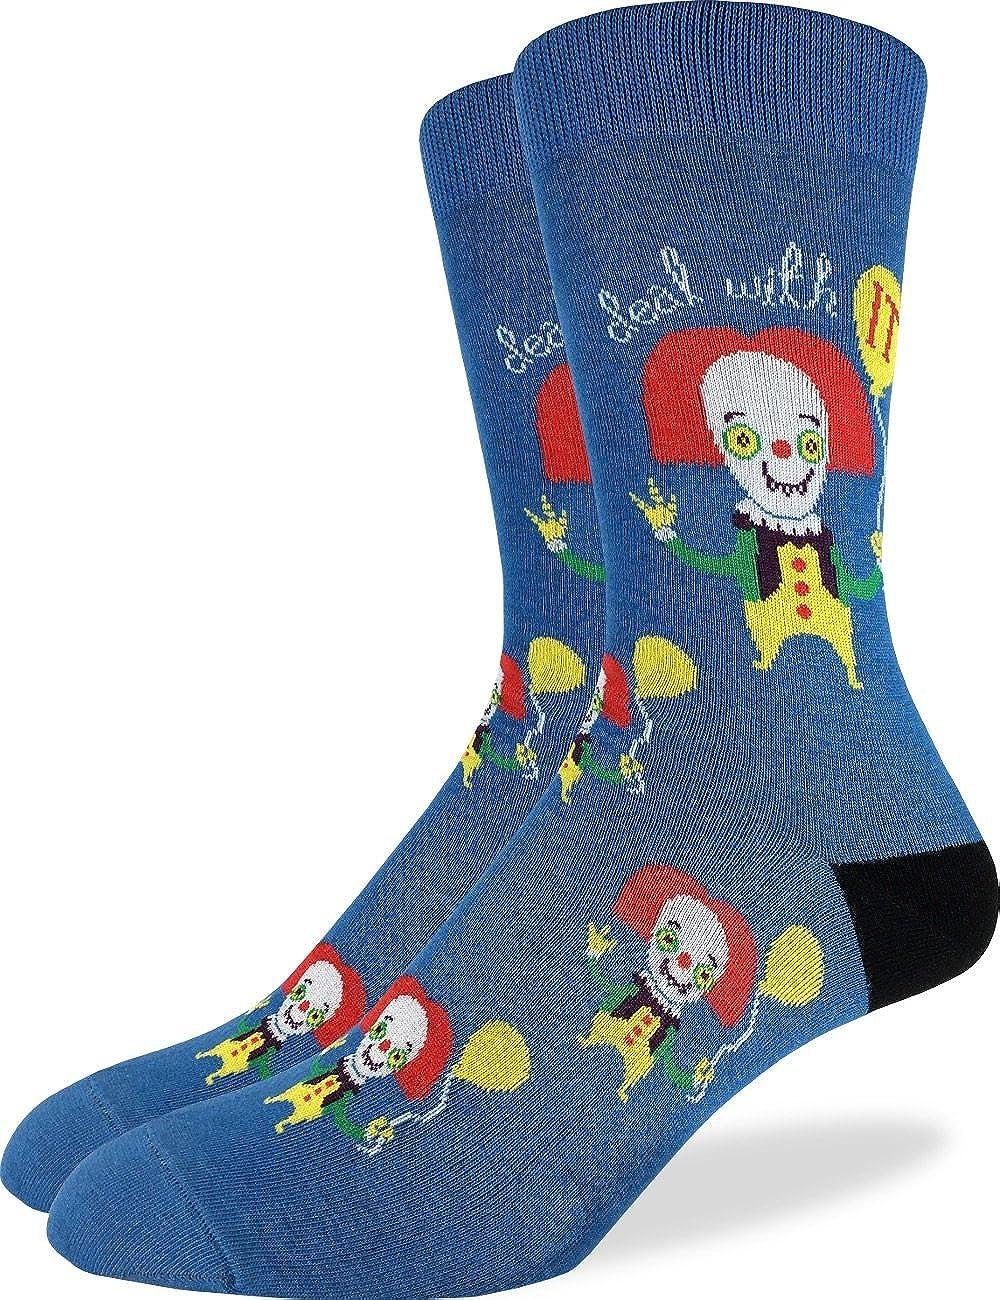 Good Luck Sock Men's Clown Crew Socks - Blue, Shoe Size 7-12 1329